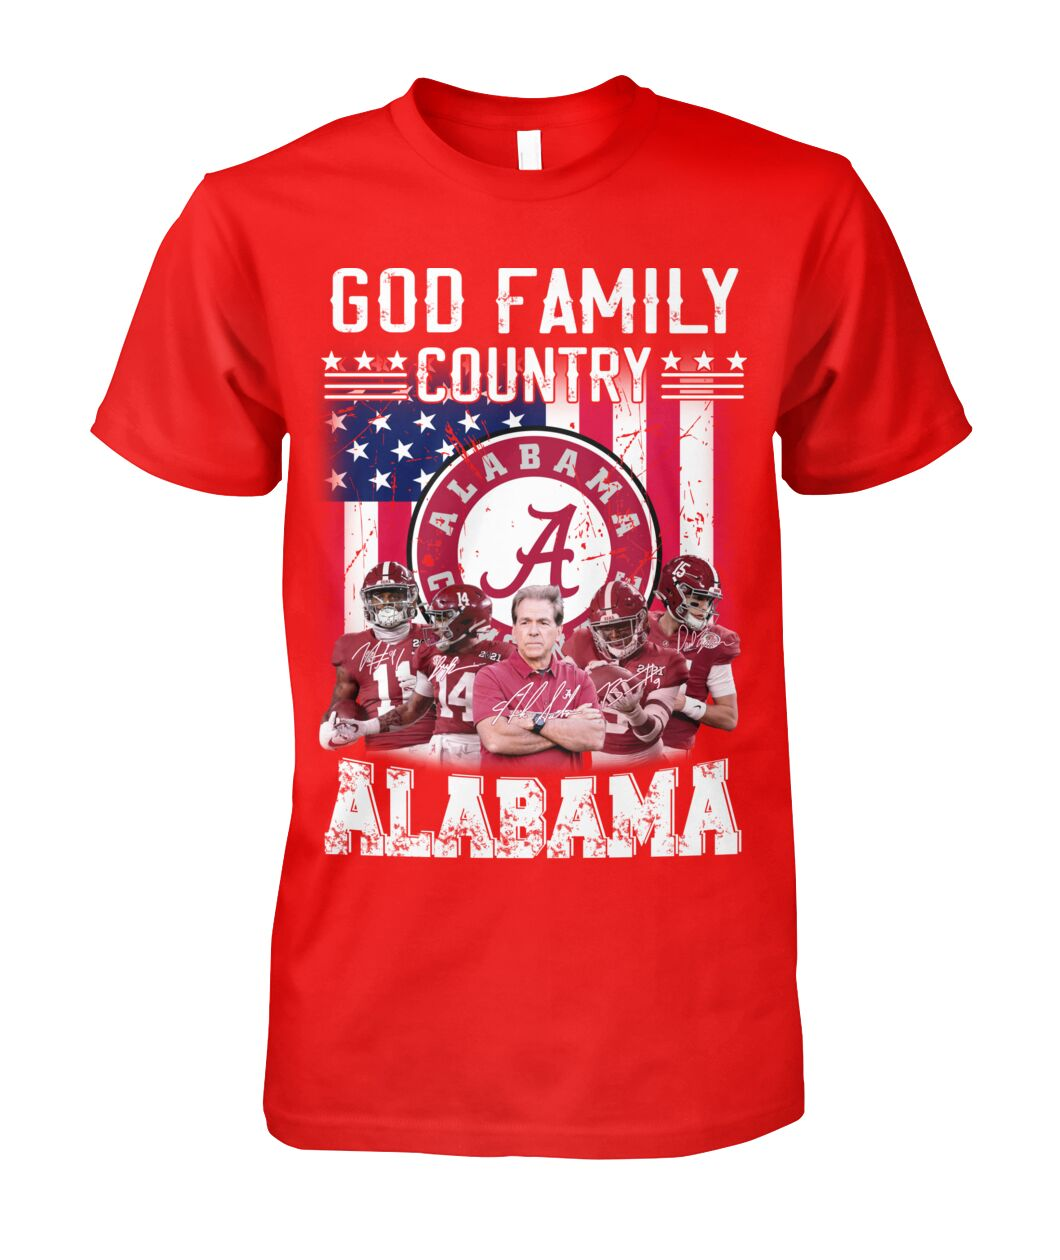 God family country Alabama crimson tide american flag shirt